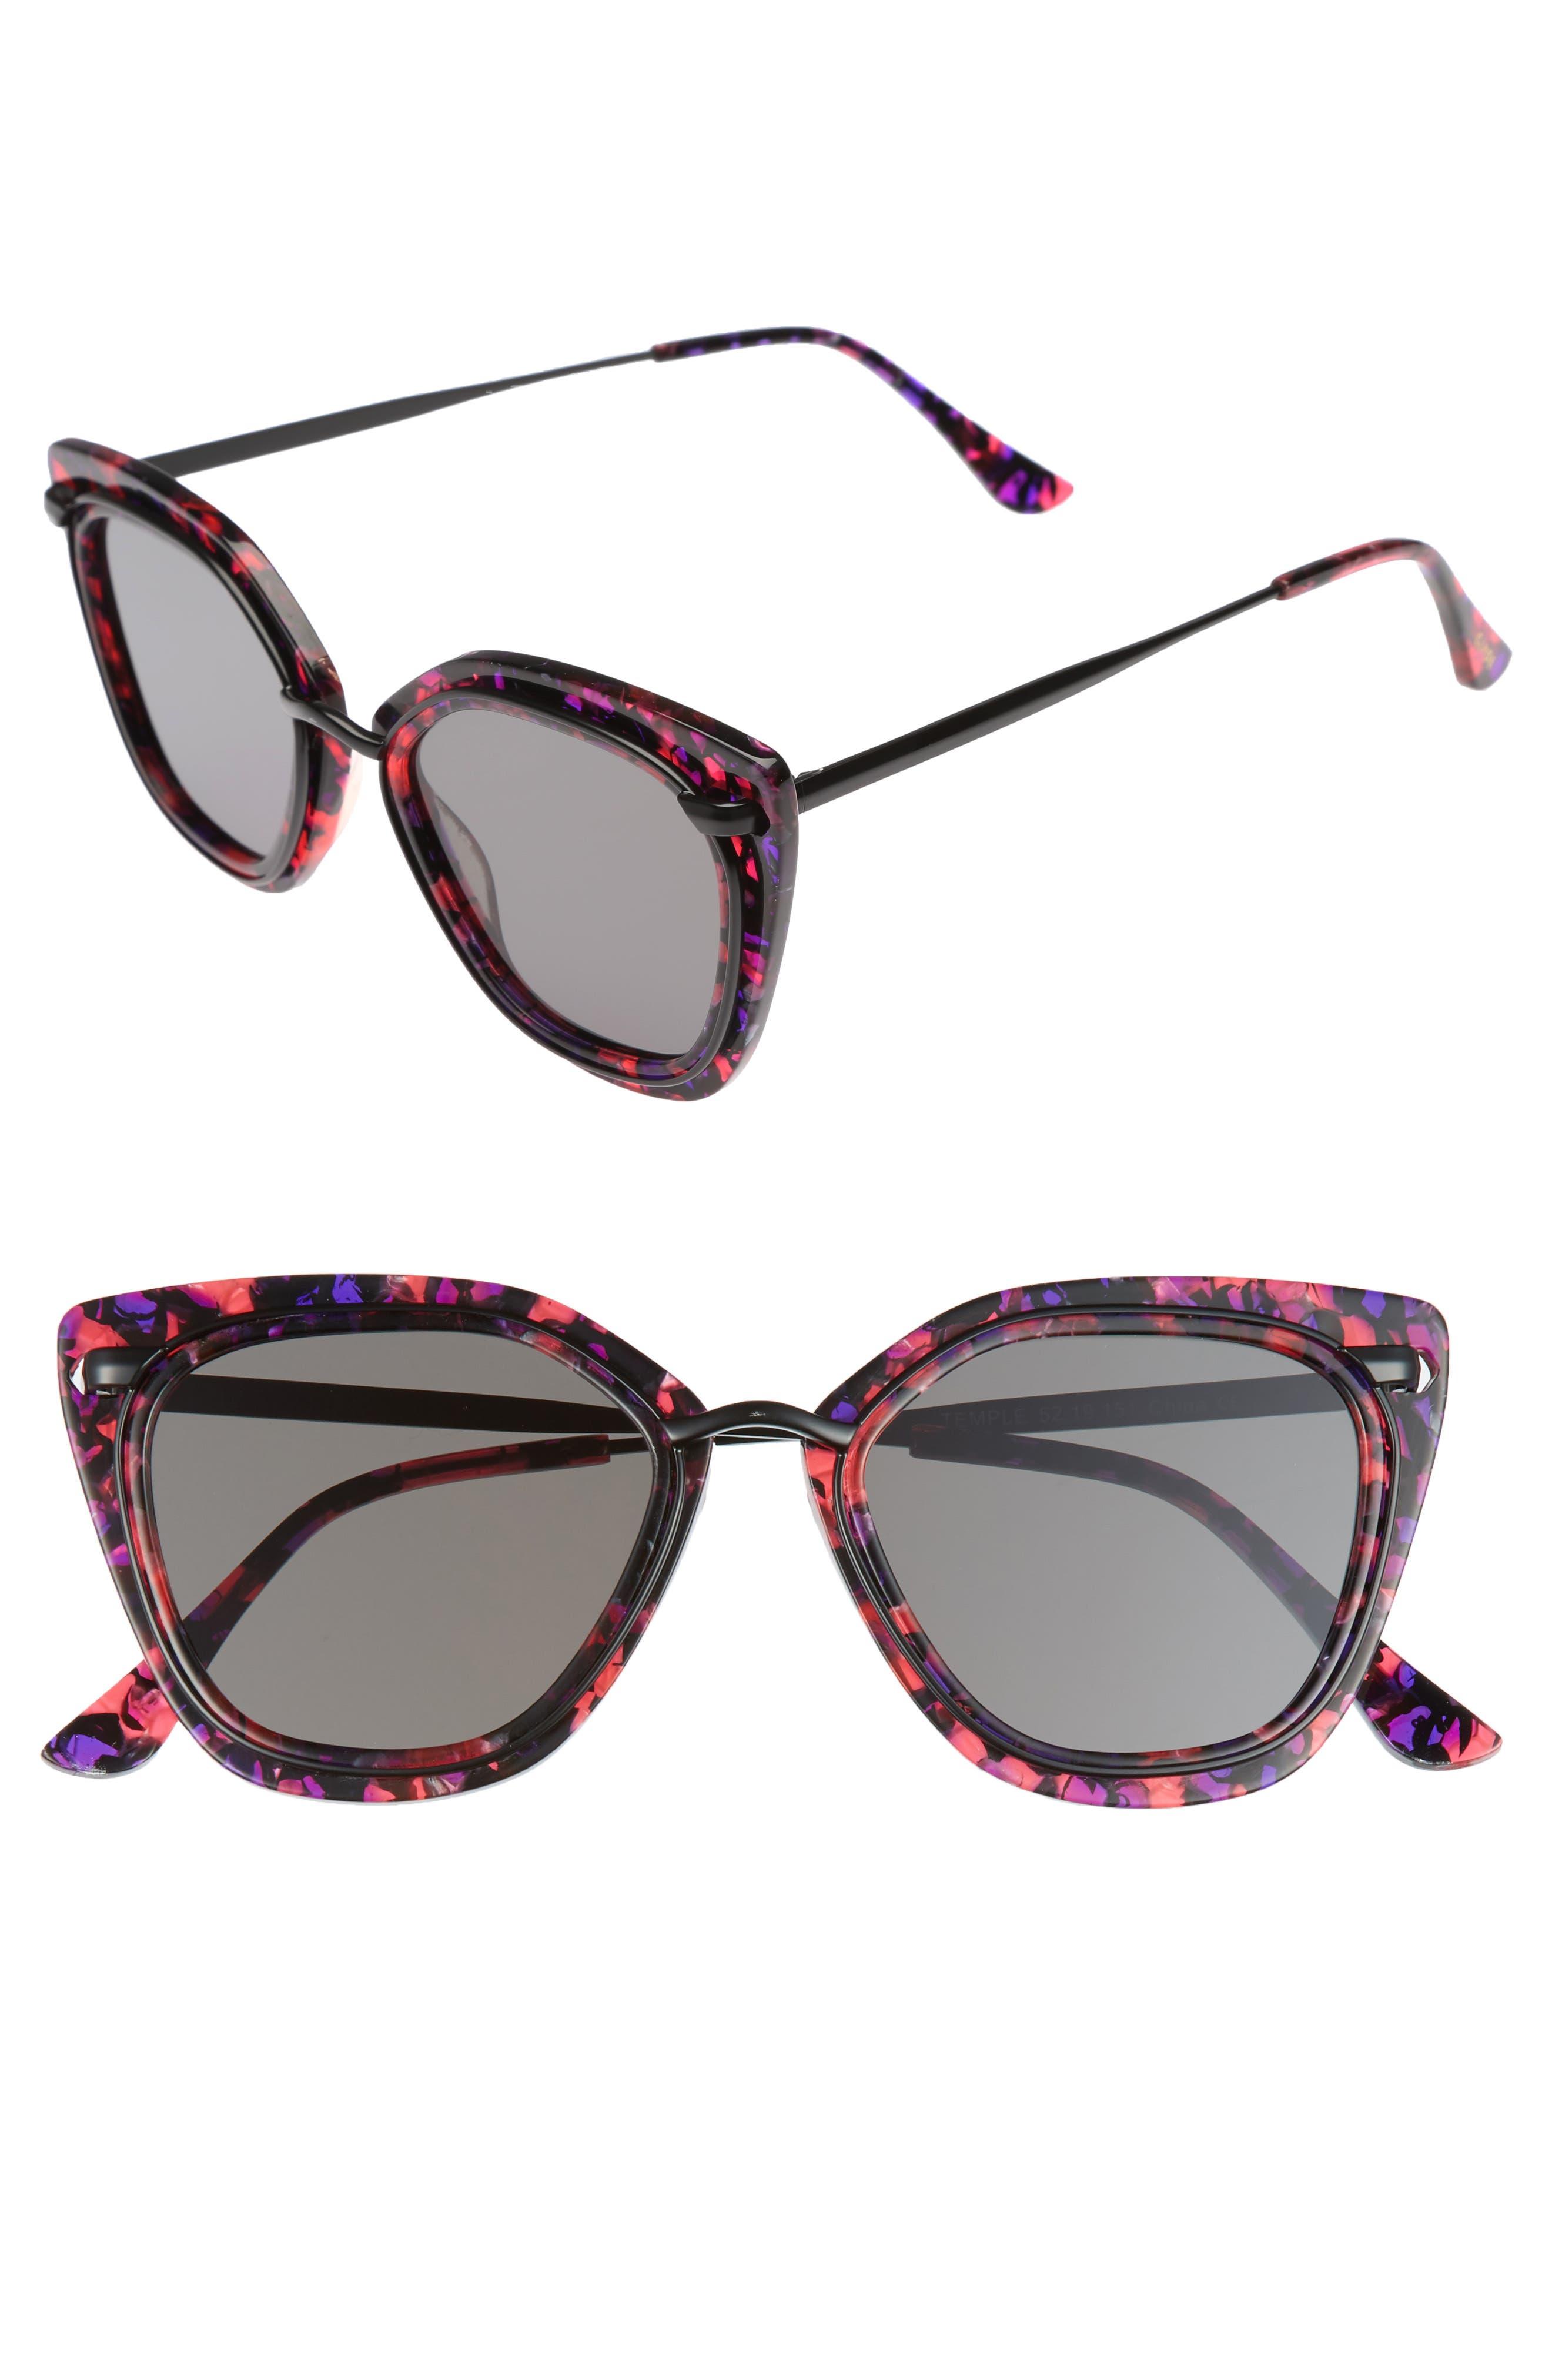 Bonnie Clyde Temple 52mm Sunglasses